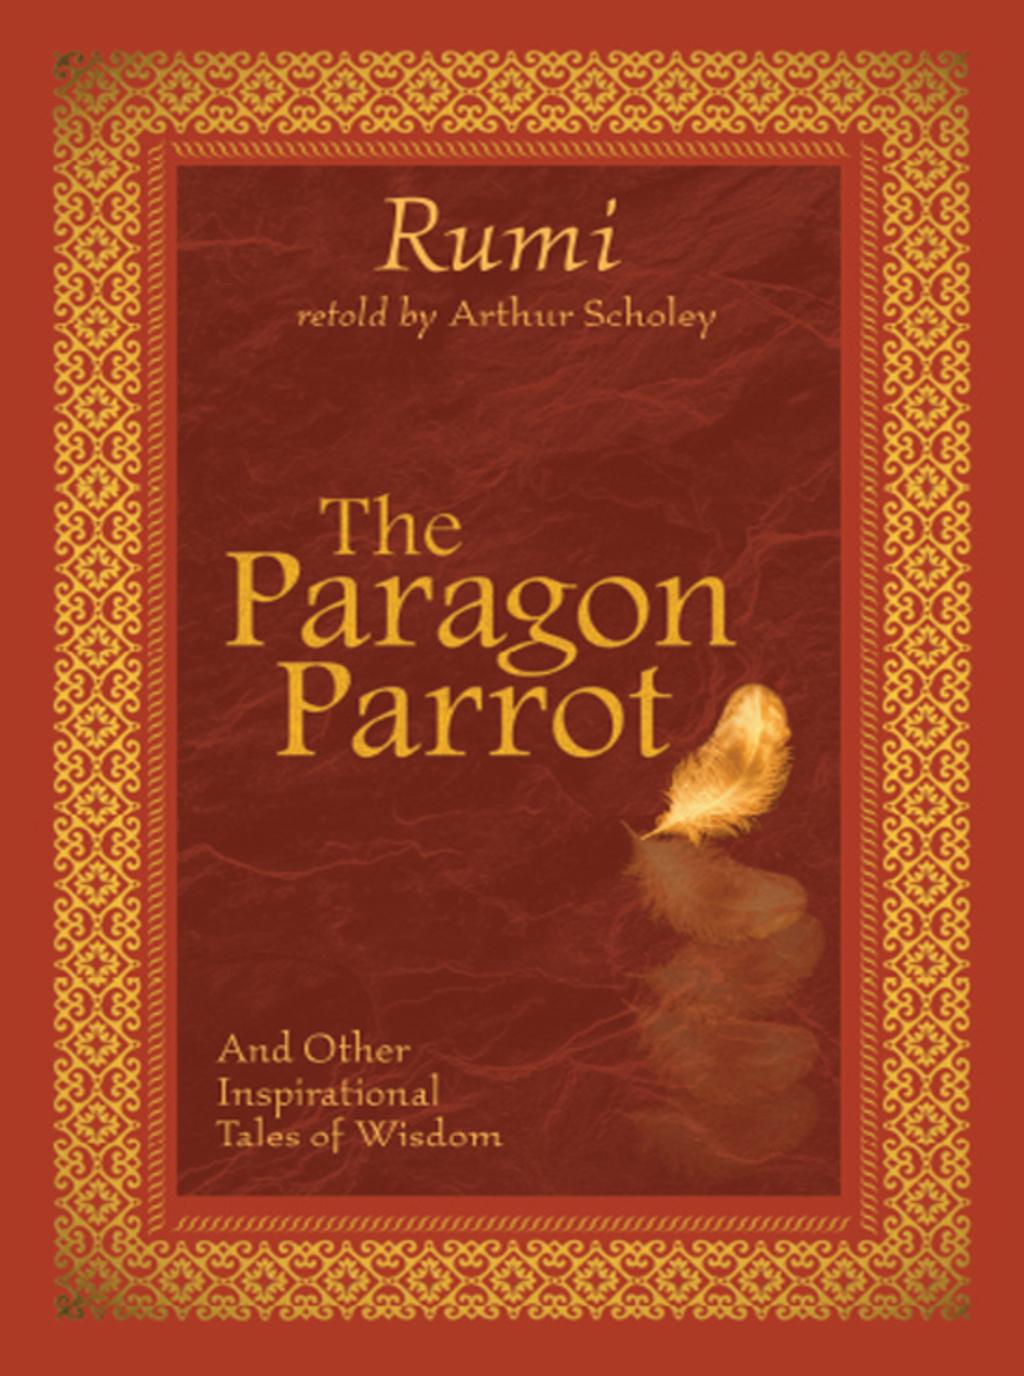 The Paragon Parrot (eBook) (9781780283388) photo